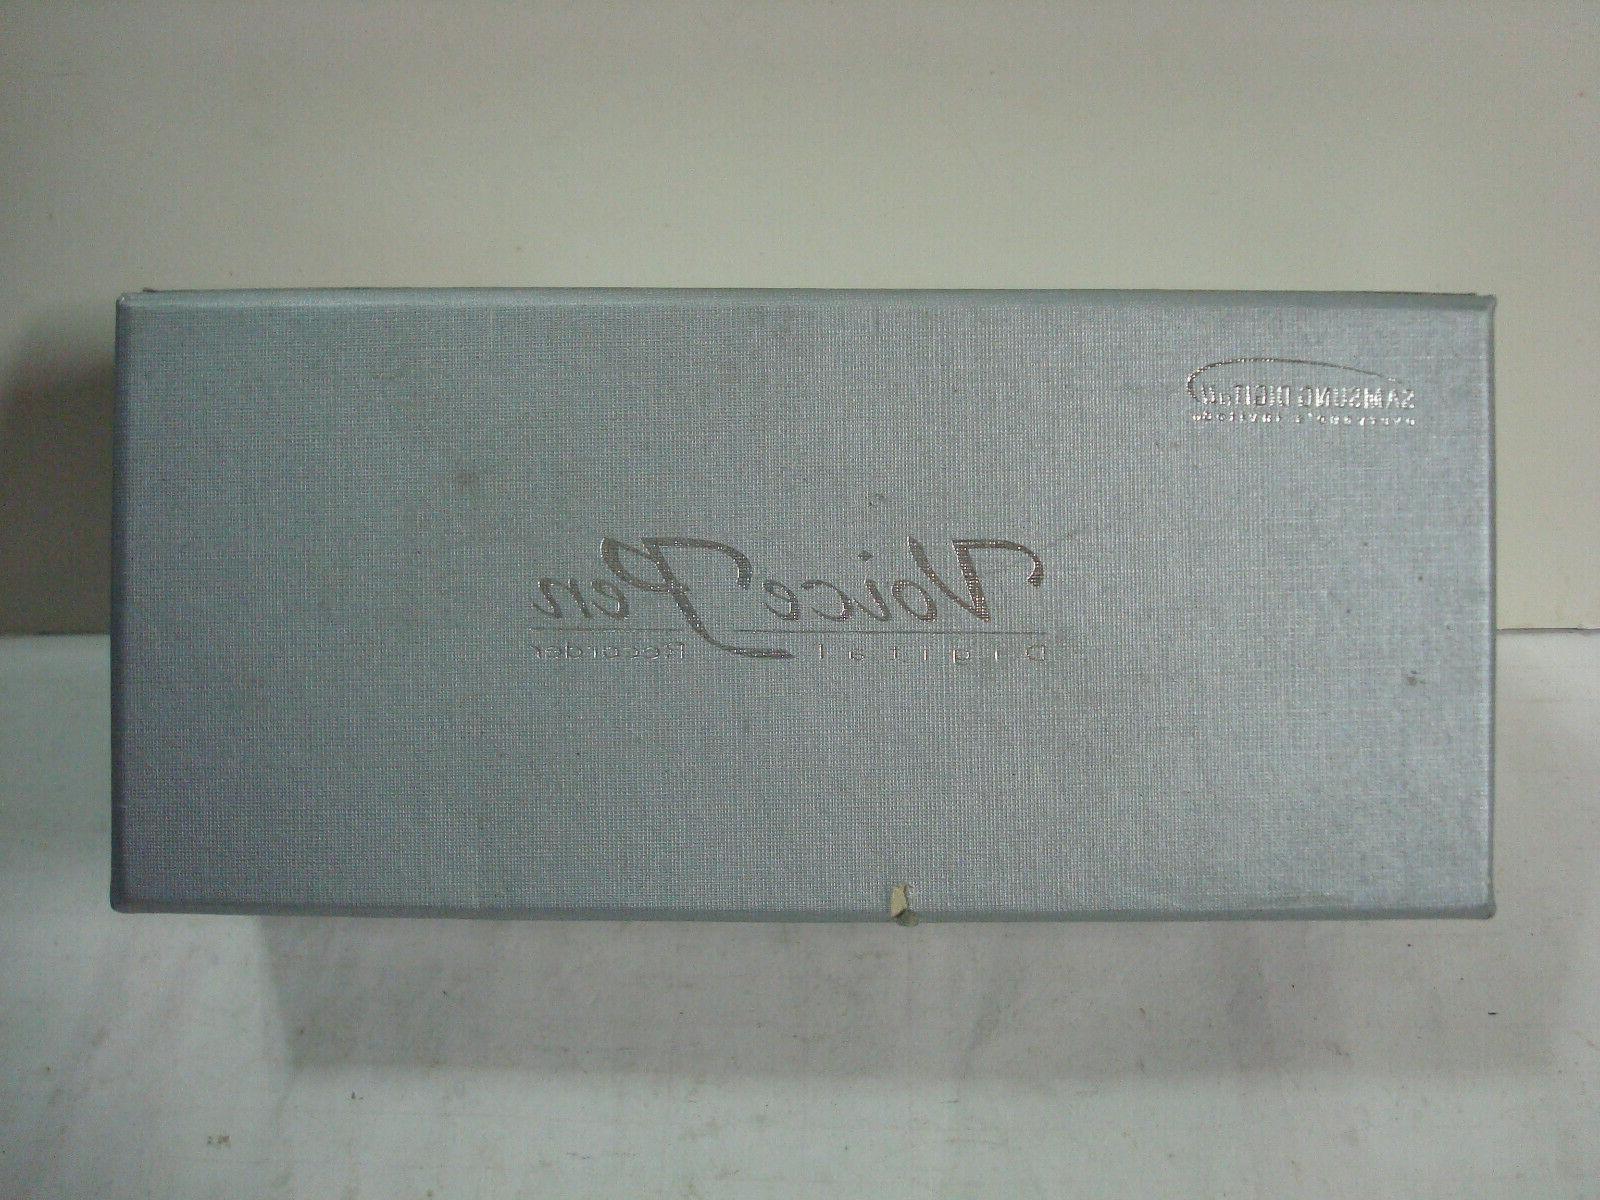 svr p220 digital voice pen recorder laser